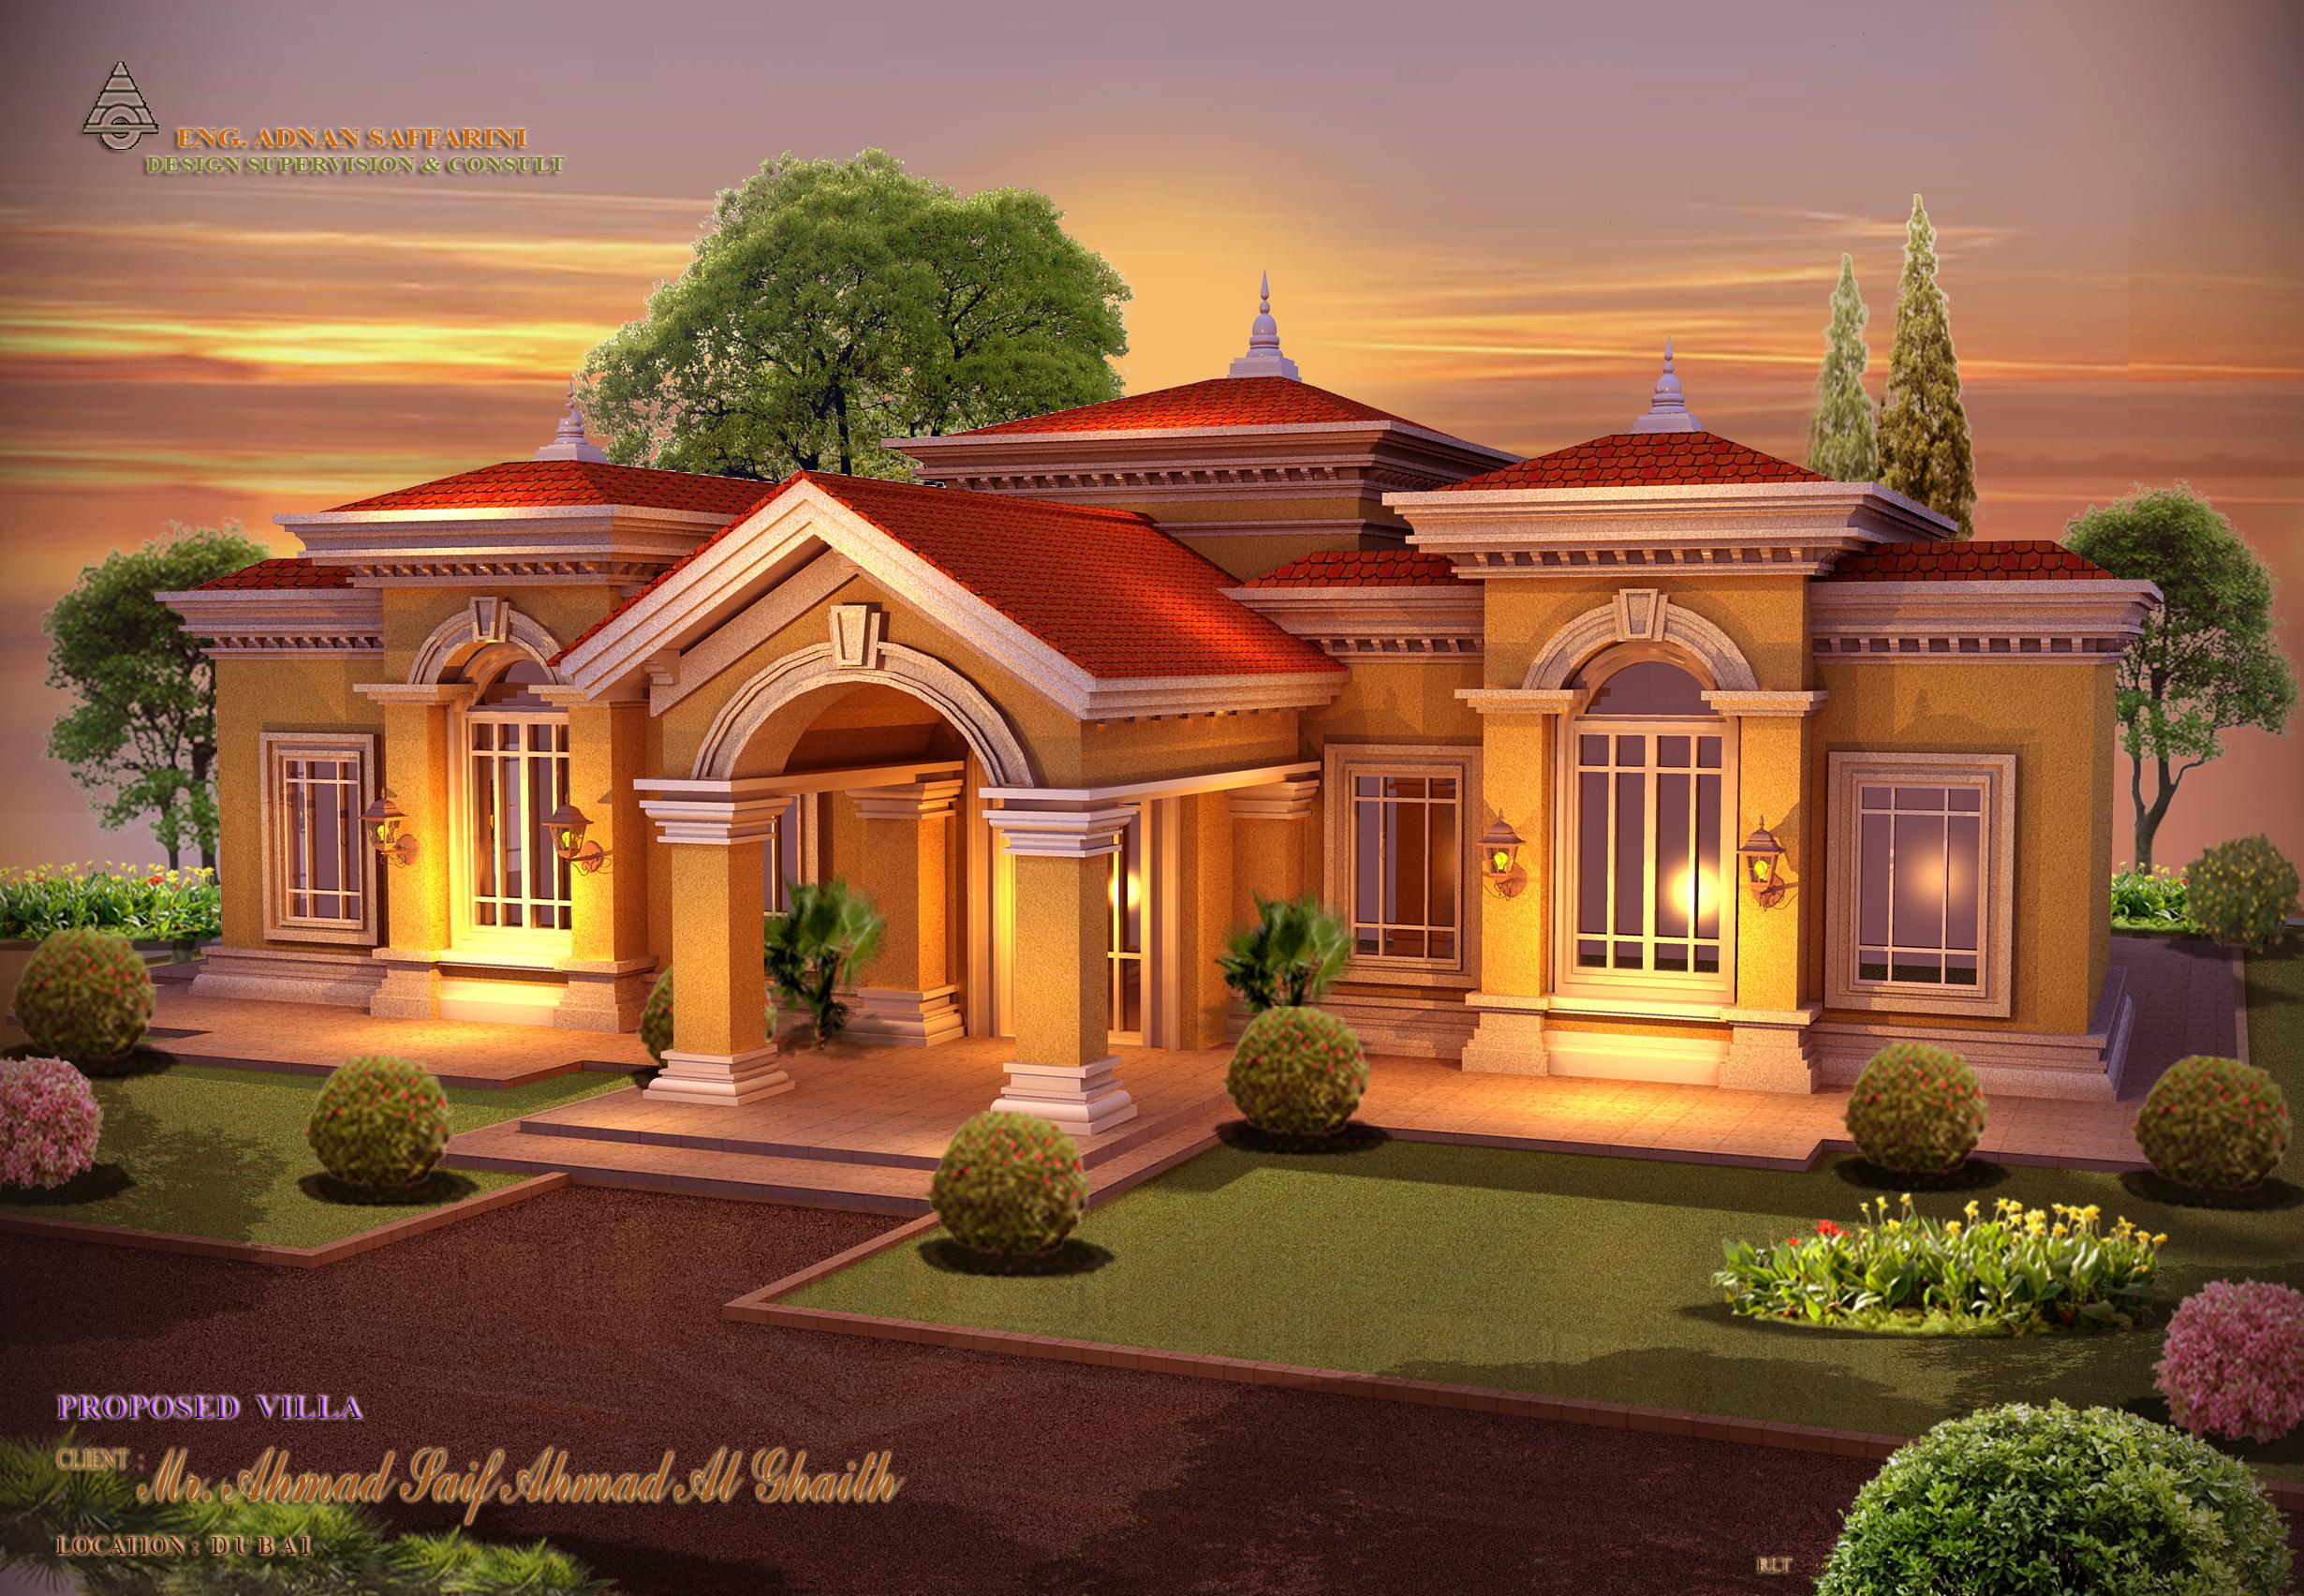 MR. AHMAD SAIF AHMAD AL GHAITH MAJLIS.